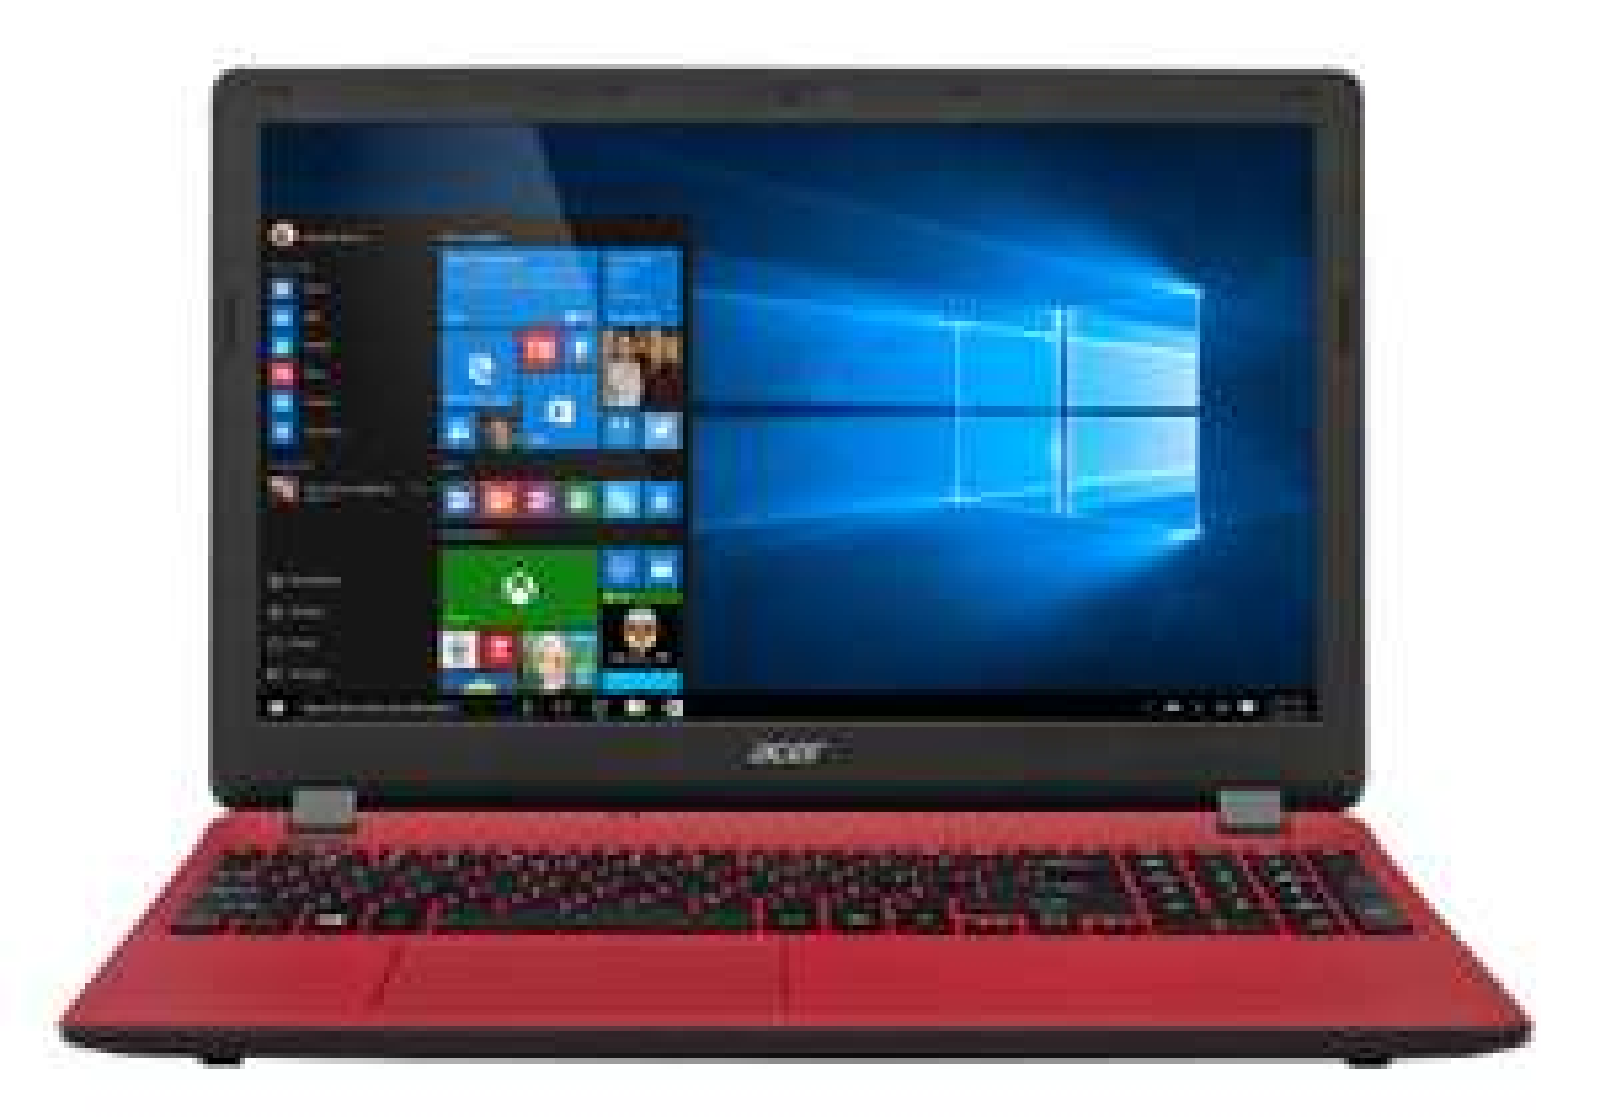 "Acer Aspire ES 15 (ES1-571-34DU) i3 5005U, 6GB RAM, 128GB SSD 15.6"" 1920 x 1080 Laptop in Red, refurbished with 12 mth warranty - £293.94 @ Ebay (Littlewoods)"